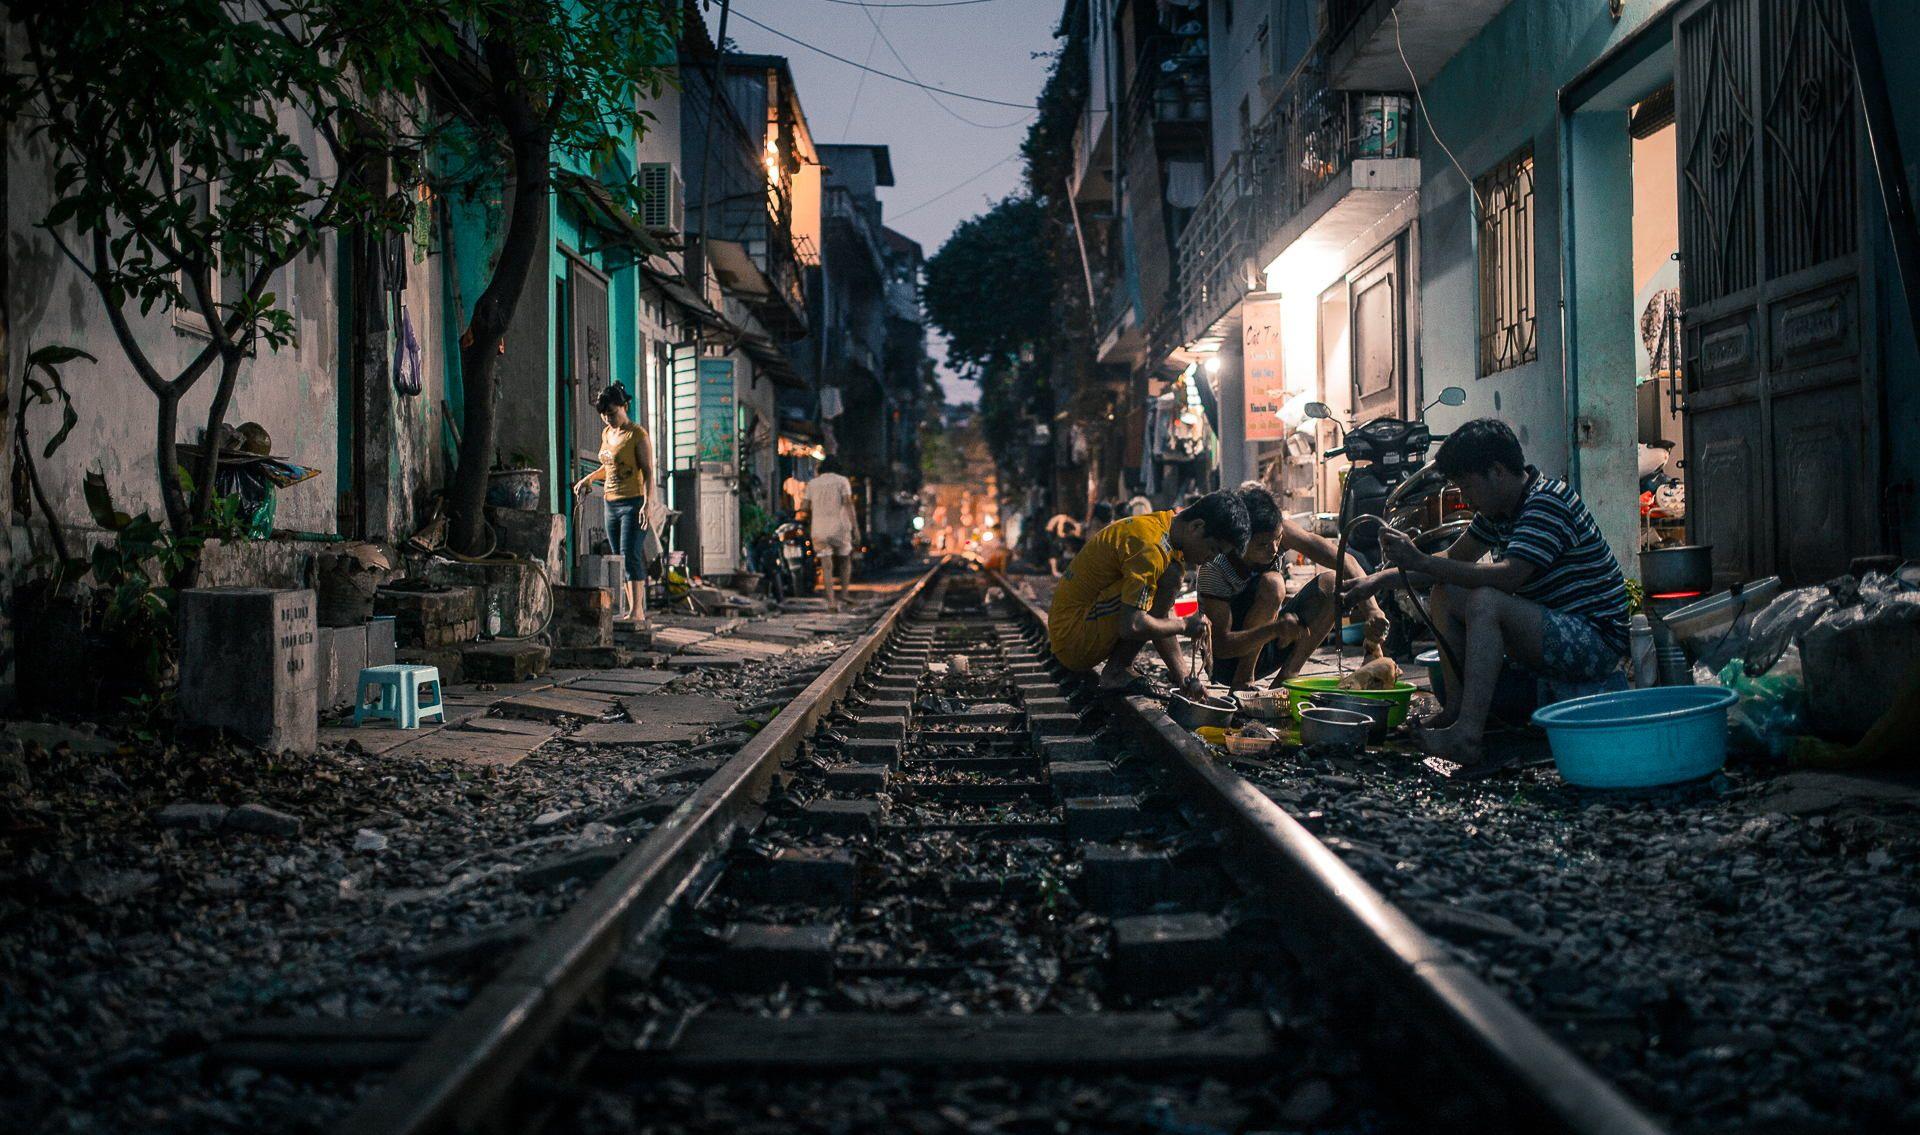 Victoria Express  Hanoi, Vietnam, 2014